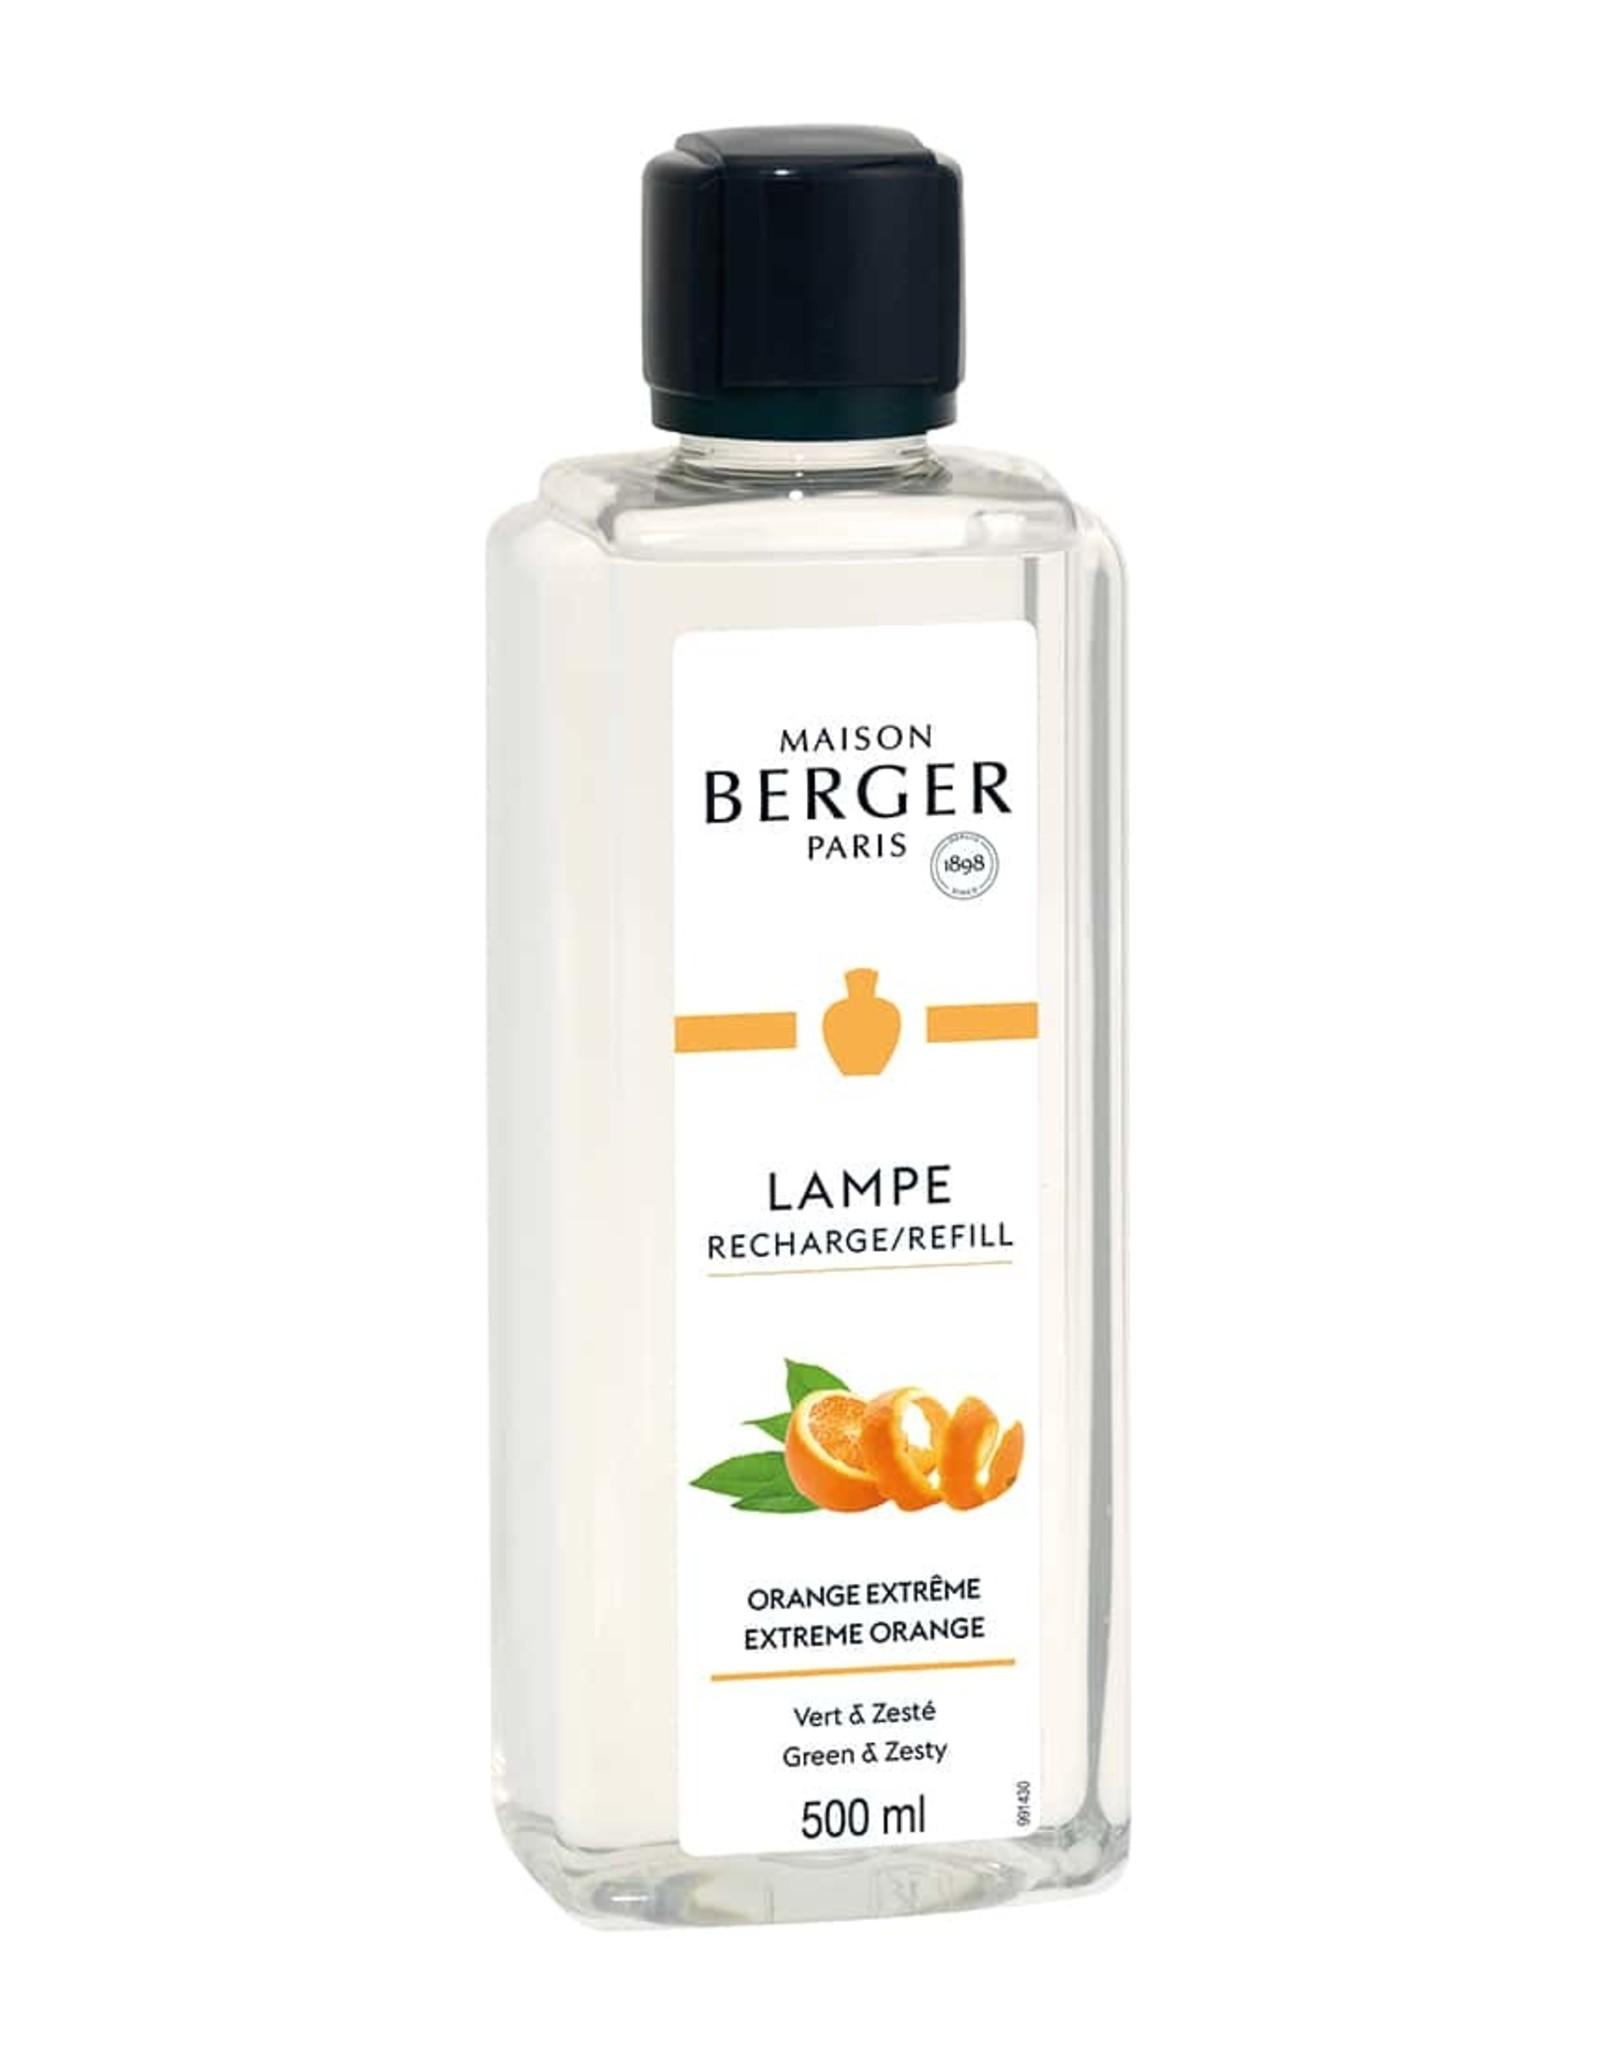 Maison Berger Orange extrème 500ml